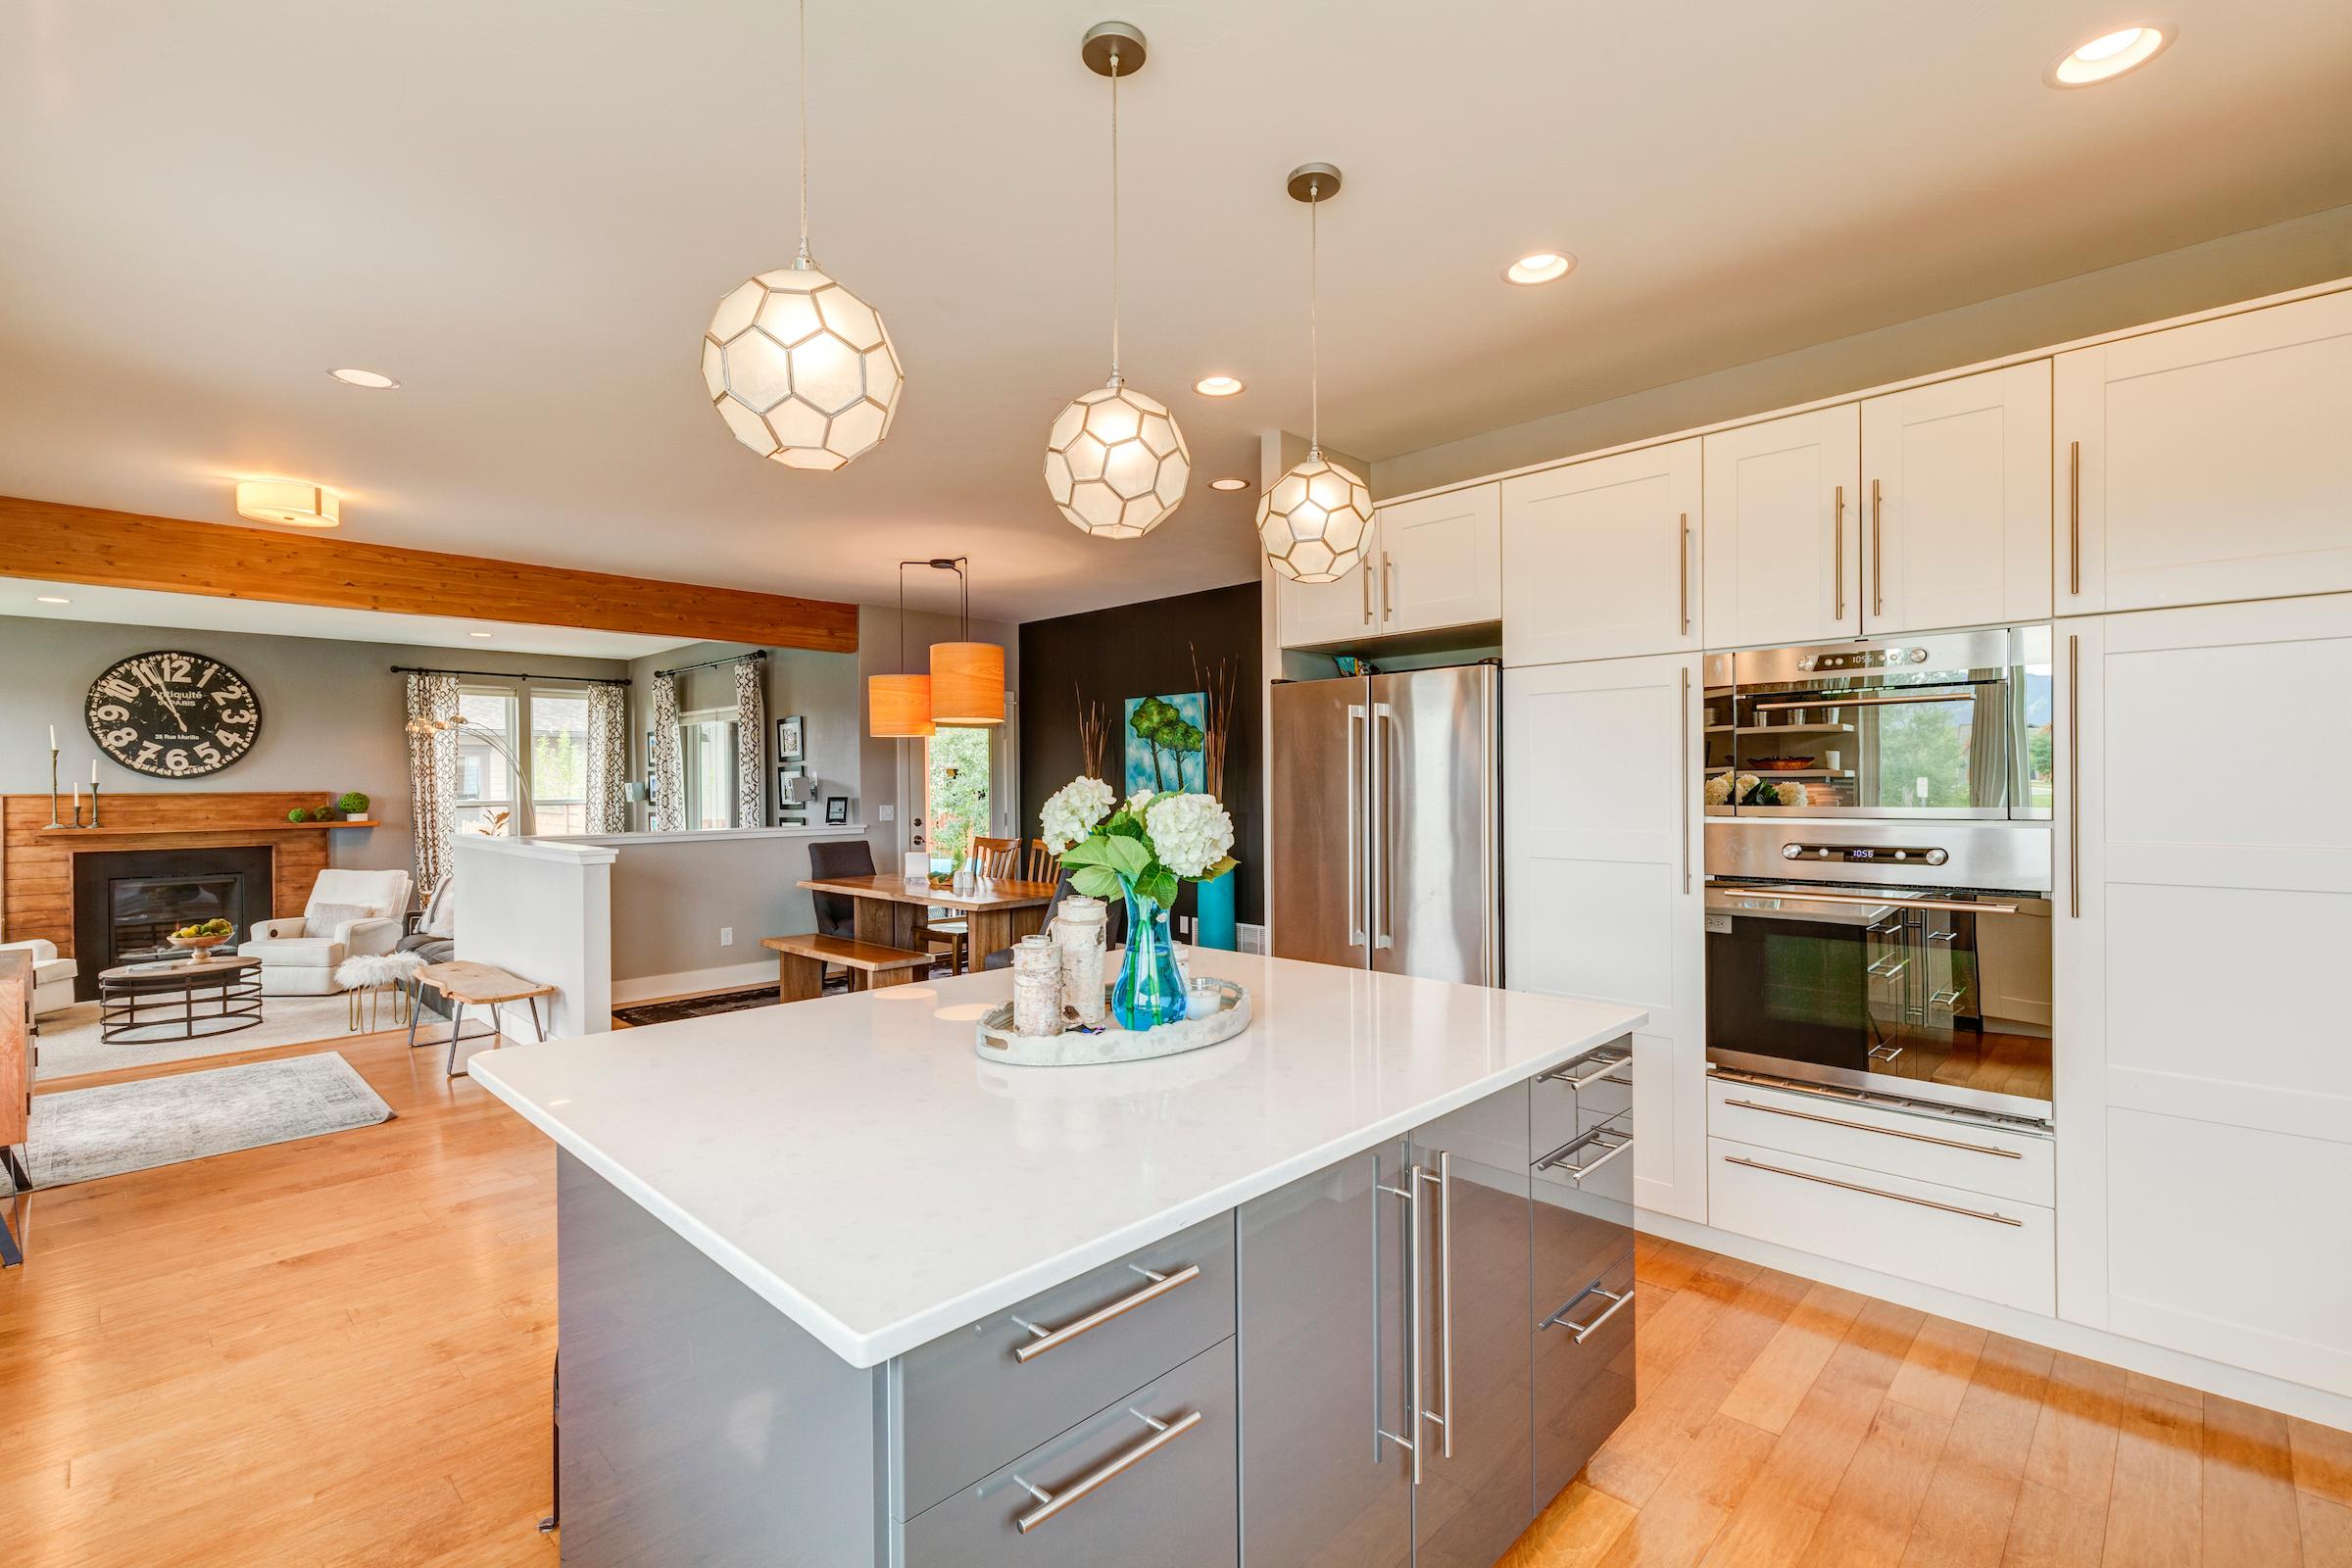 Modern Homes For Sale In Bozeman Montana Bozeman Real